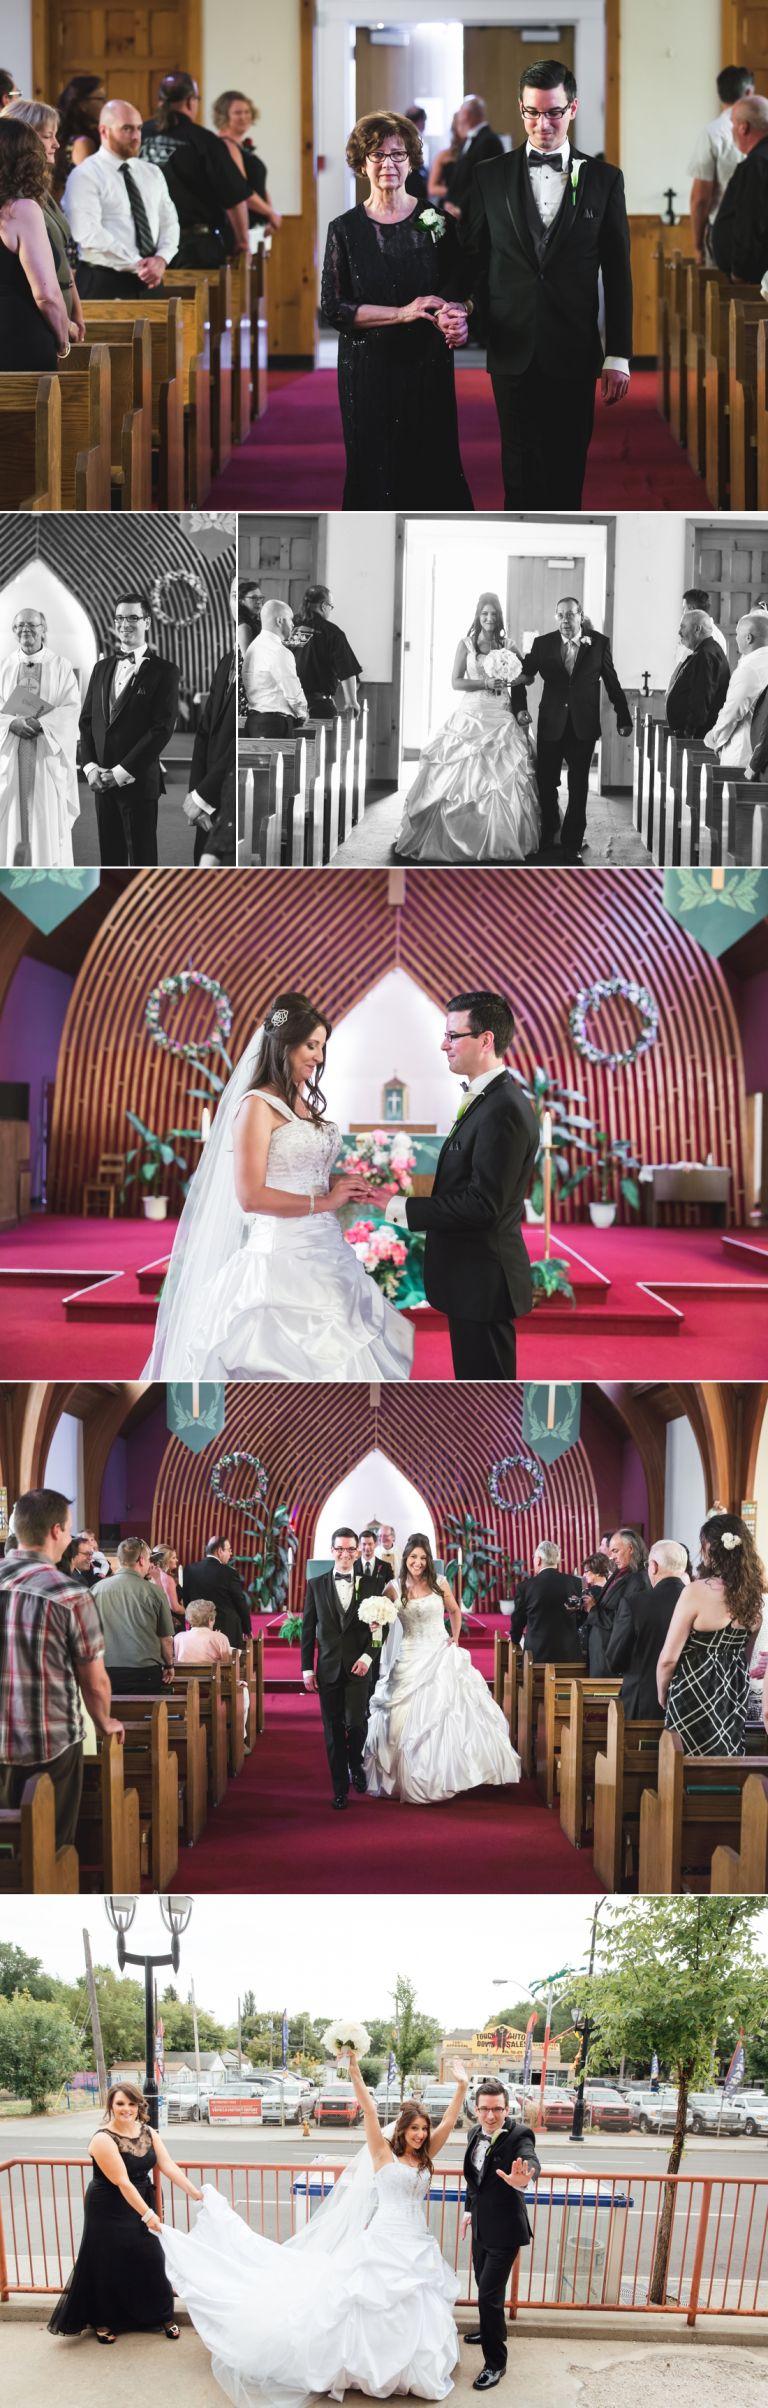 Wedding Photography at St. Alphonsus Parish in Edmonton